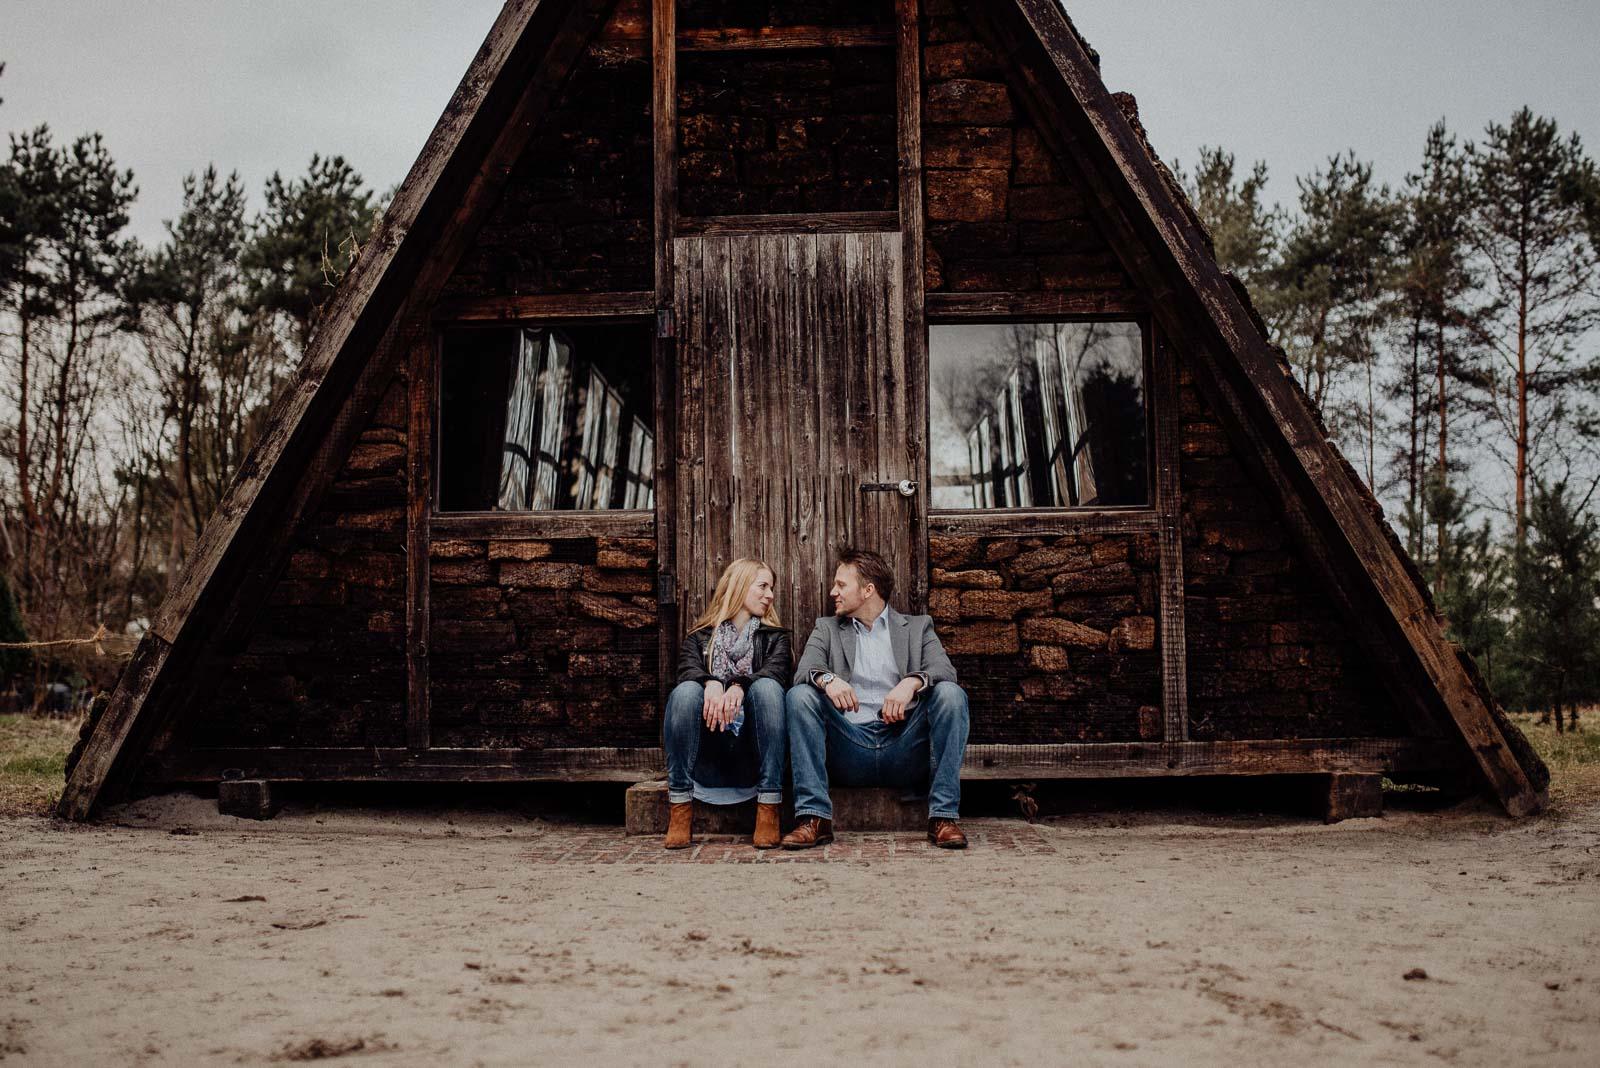 049-verlobungsshooting-engagement-fotograf-witten-rombergpark-dortmund